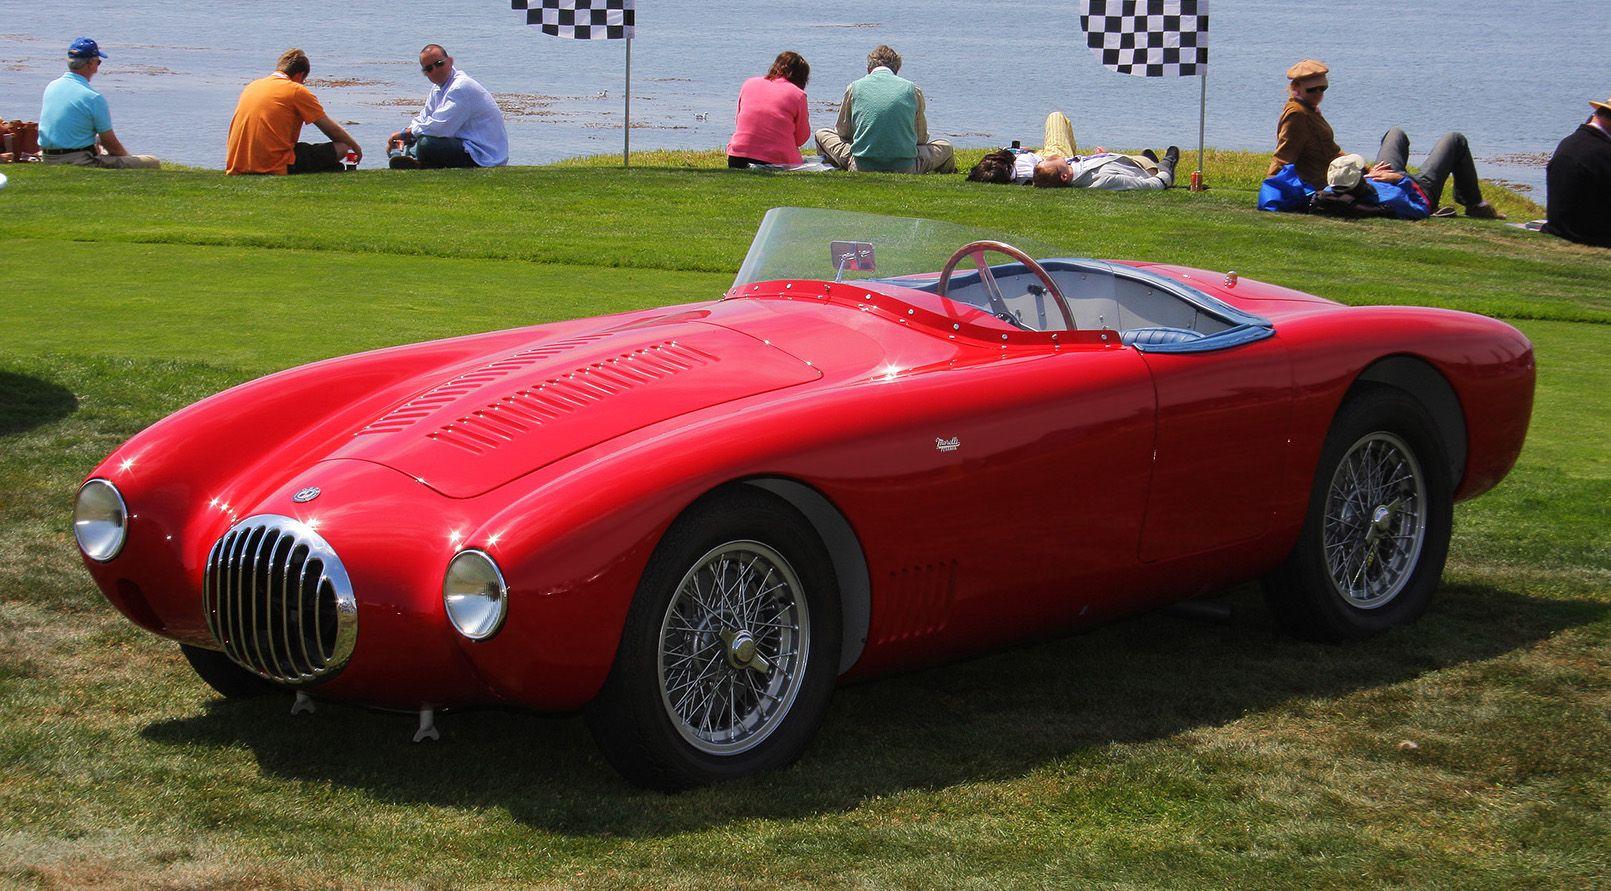 1955 Osca Mt4 Morelli Spider Vintage Cars Maserati Vintage